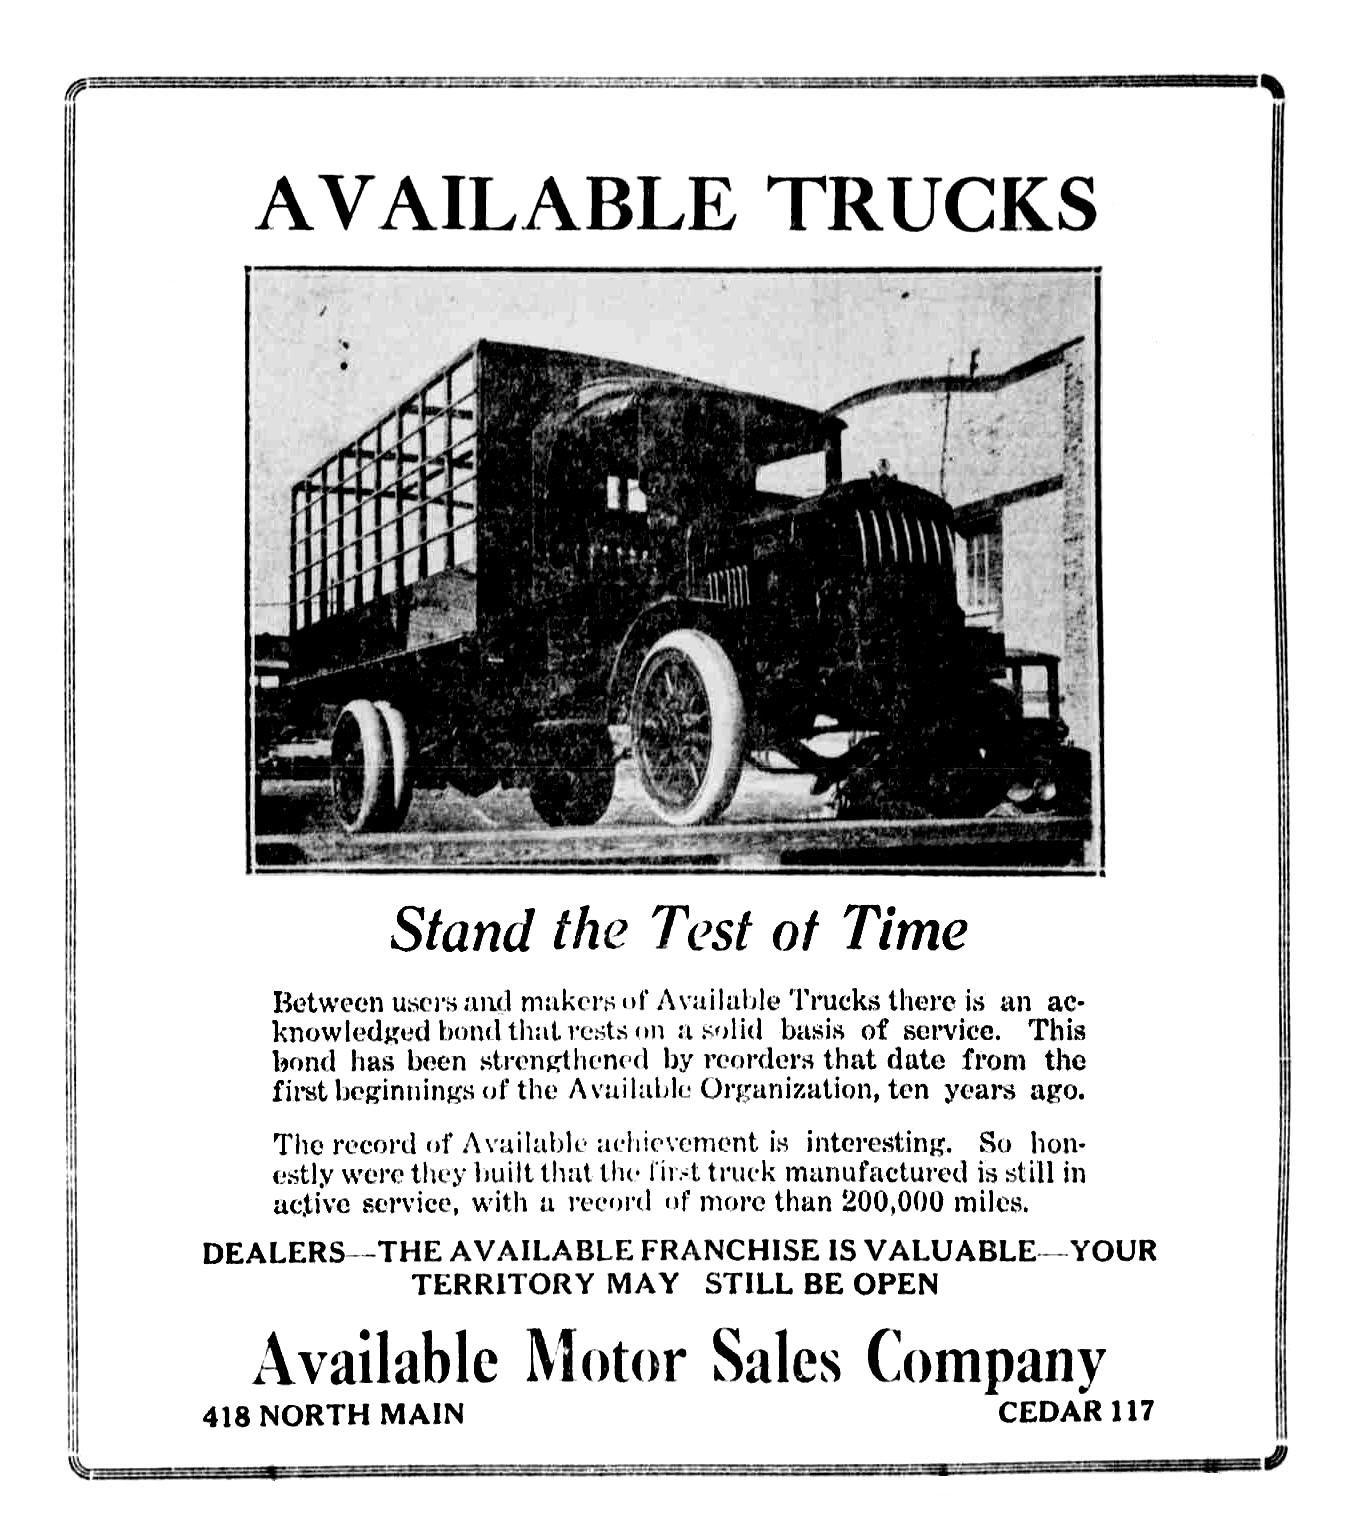 Available H JH L J S R mercial vehicles Trucksplanet